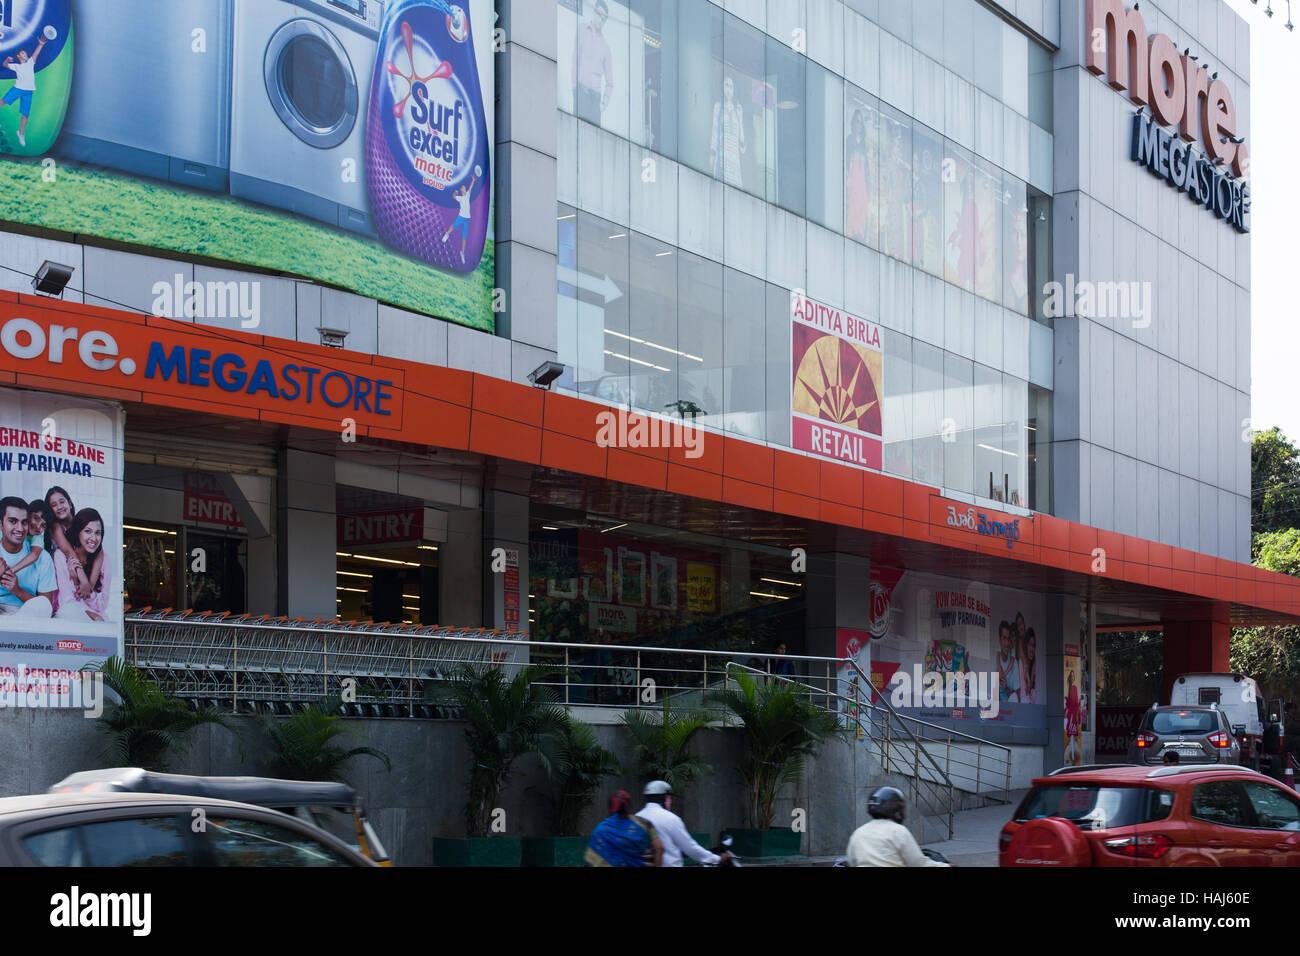 HYDERABAD, INDIA - DECEMBER 01,2016 More Megastore is India's leading supermarket.It is a part of Aditya Birla - Stock Image